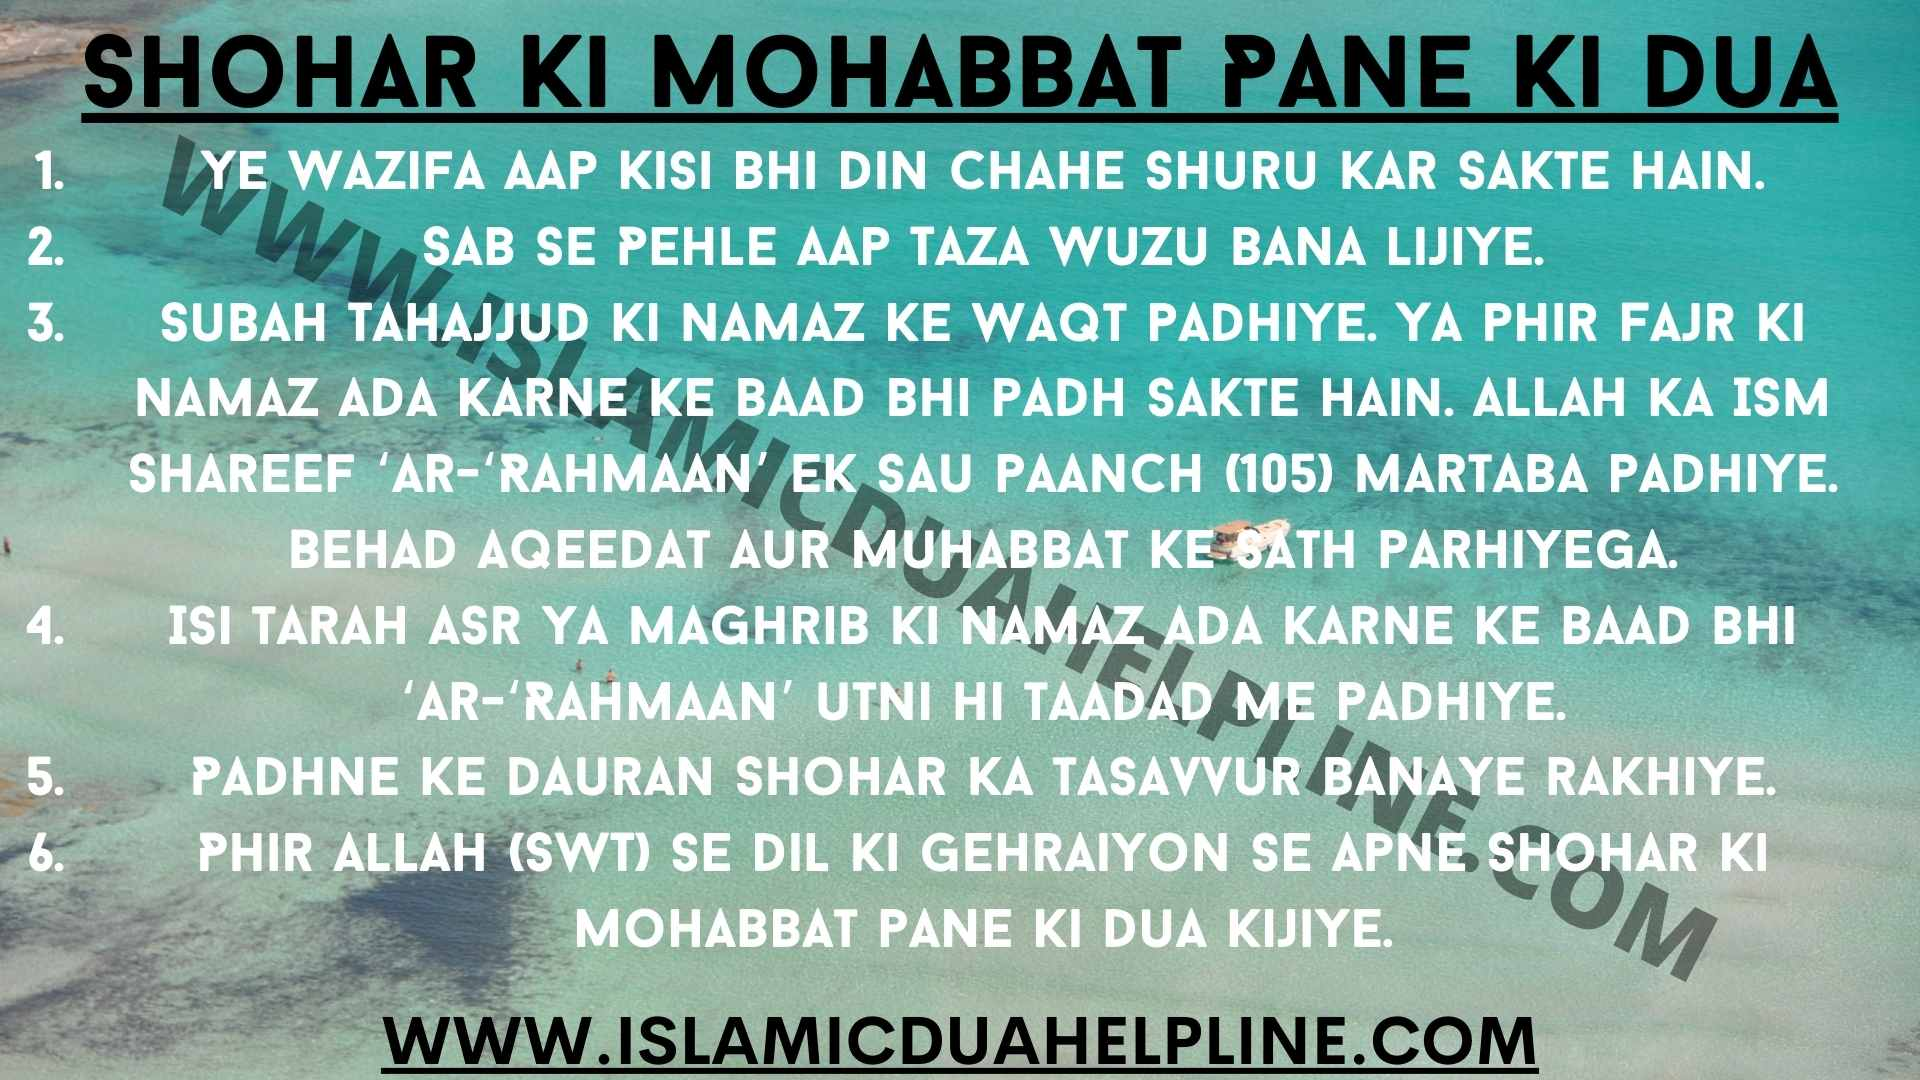 Shohar Ki Mohabbat Pane Ki Dua